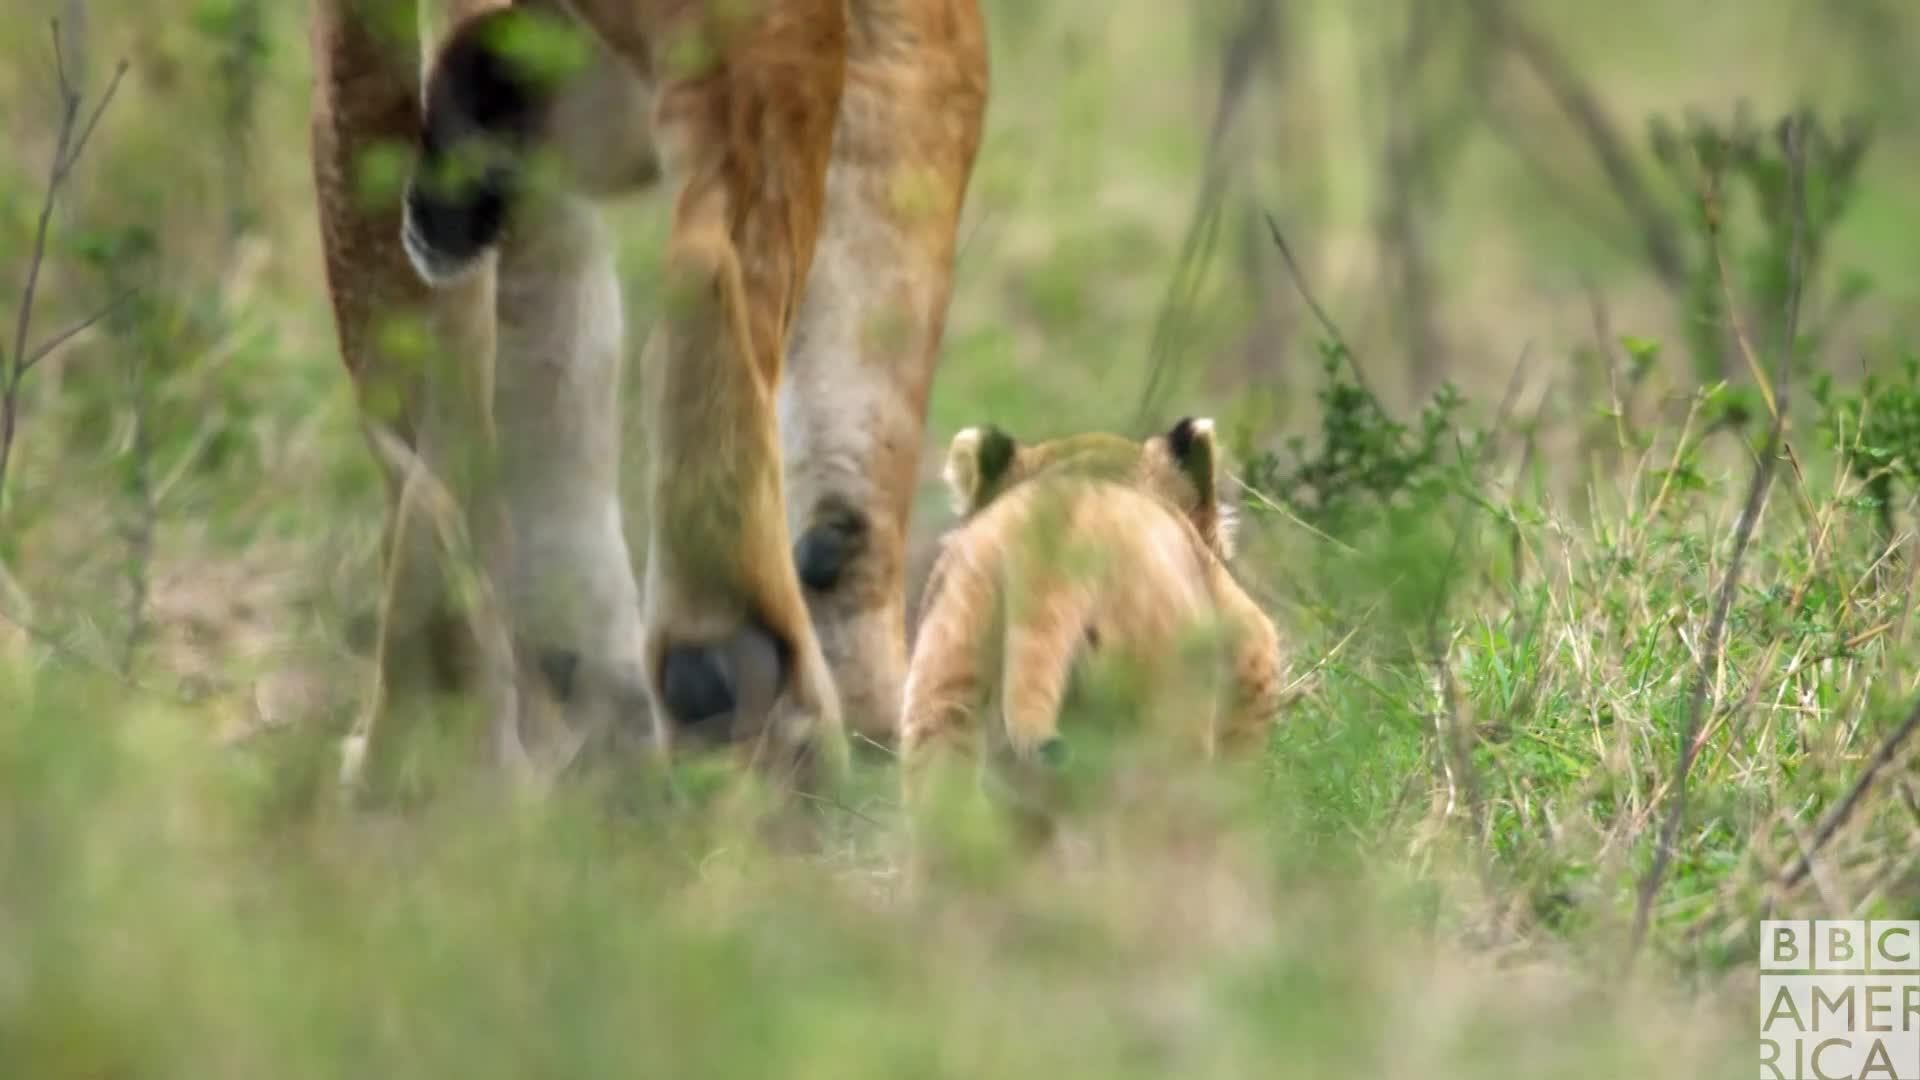 animal, animals, bbc america, bbc america dynasties, bbc america: dynasties, bye, dynasties, late, lion, lions, see ya, see you later, Dynasties Lion Cub Follows Mom GIFs